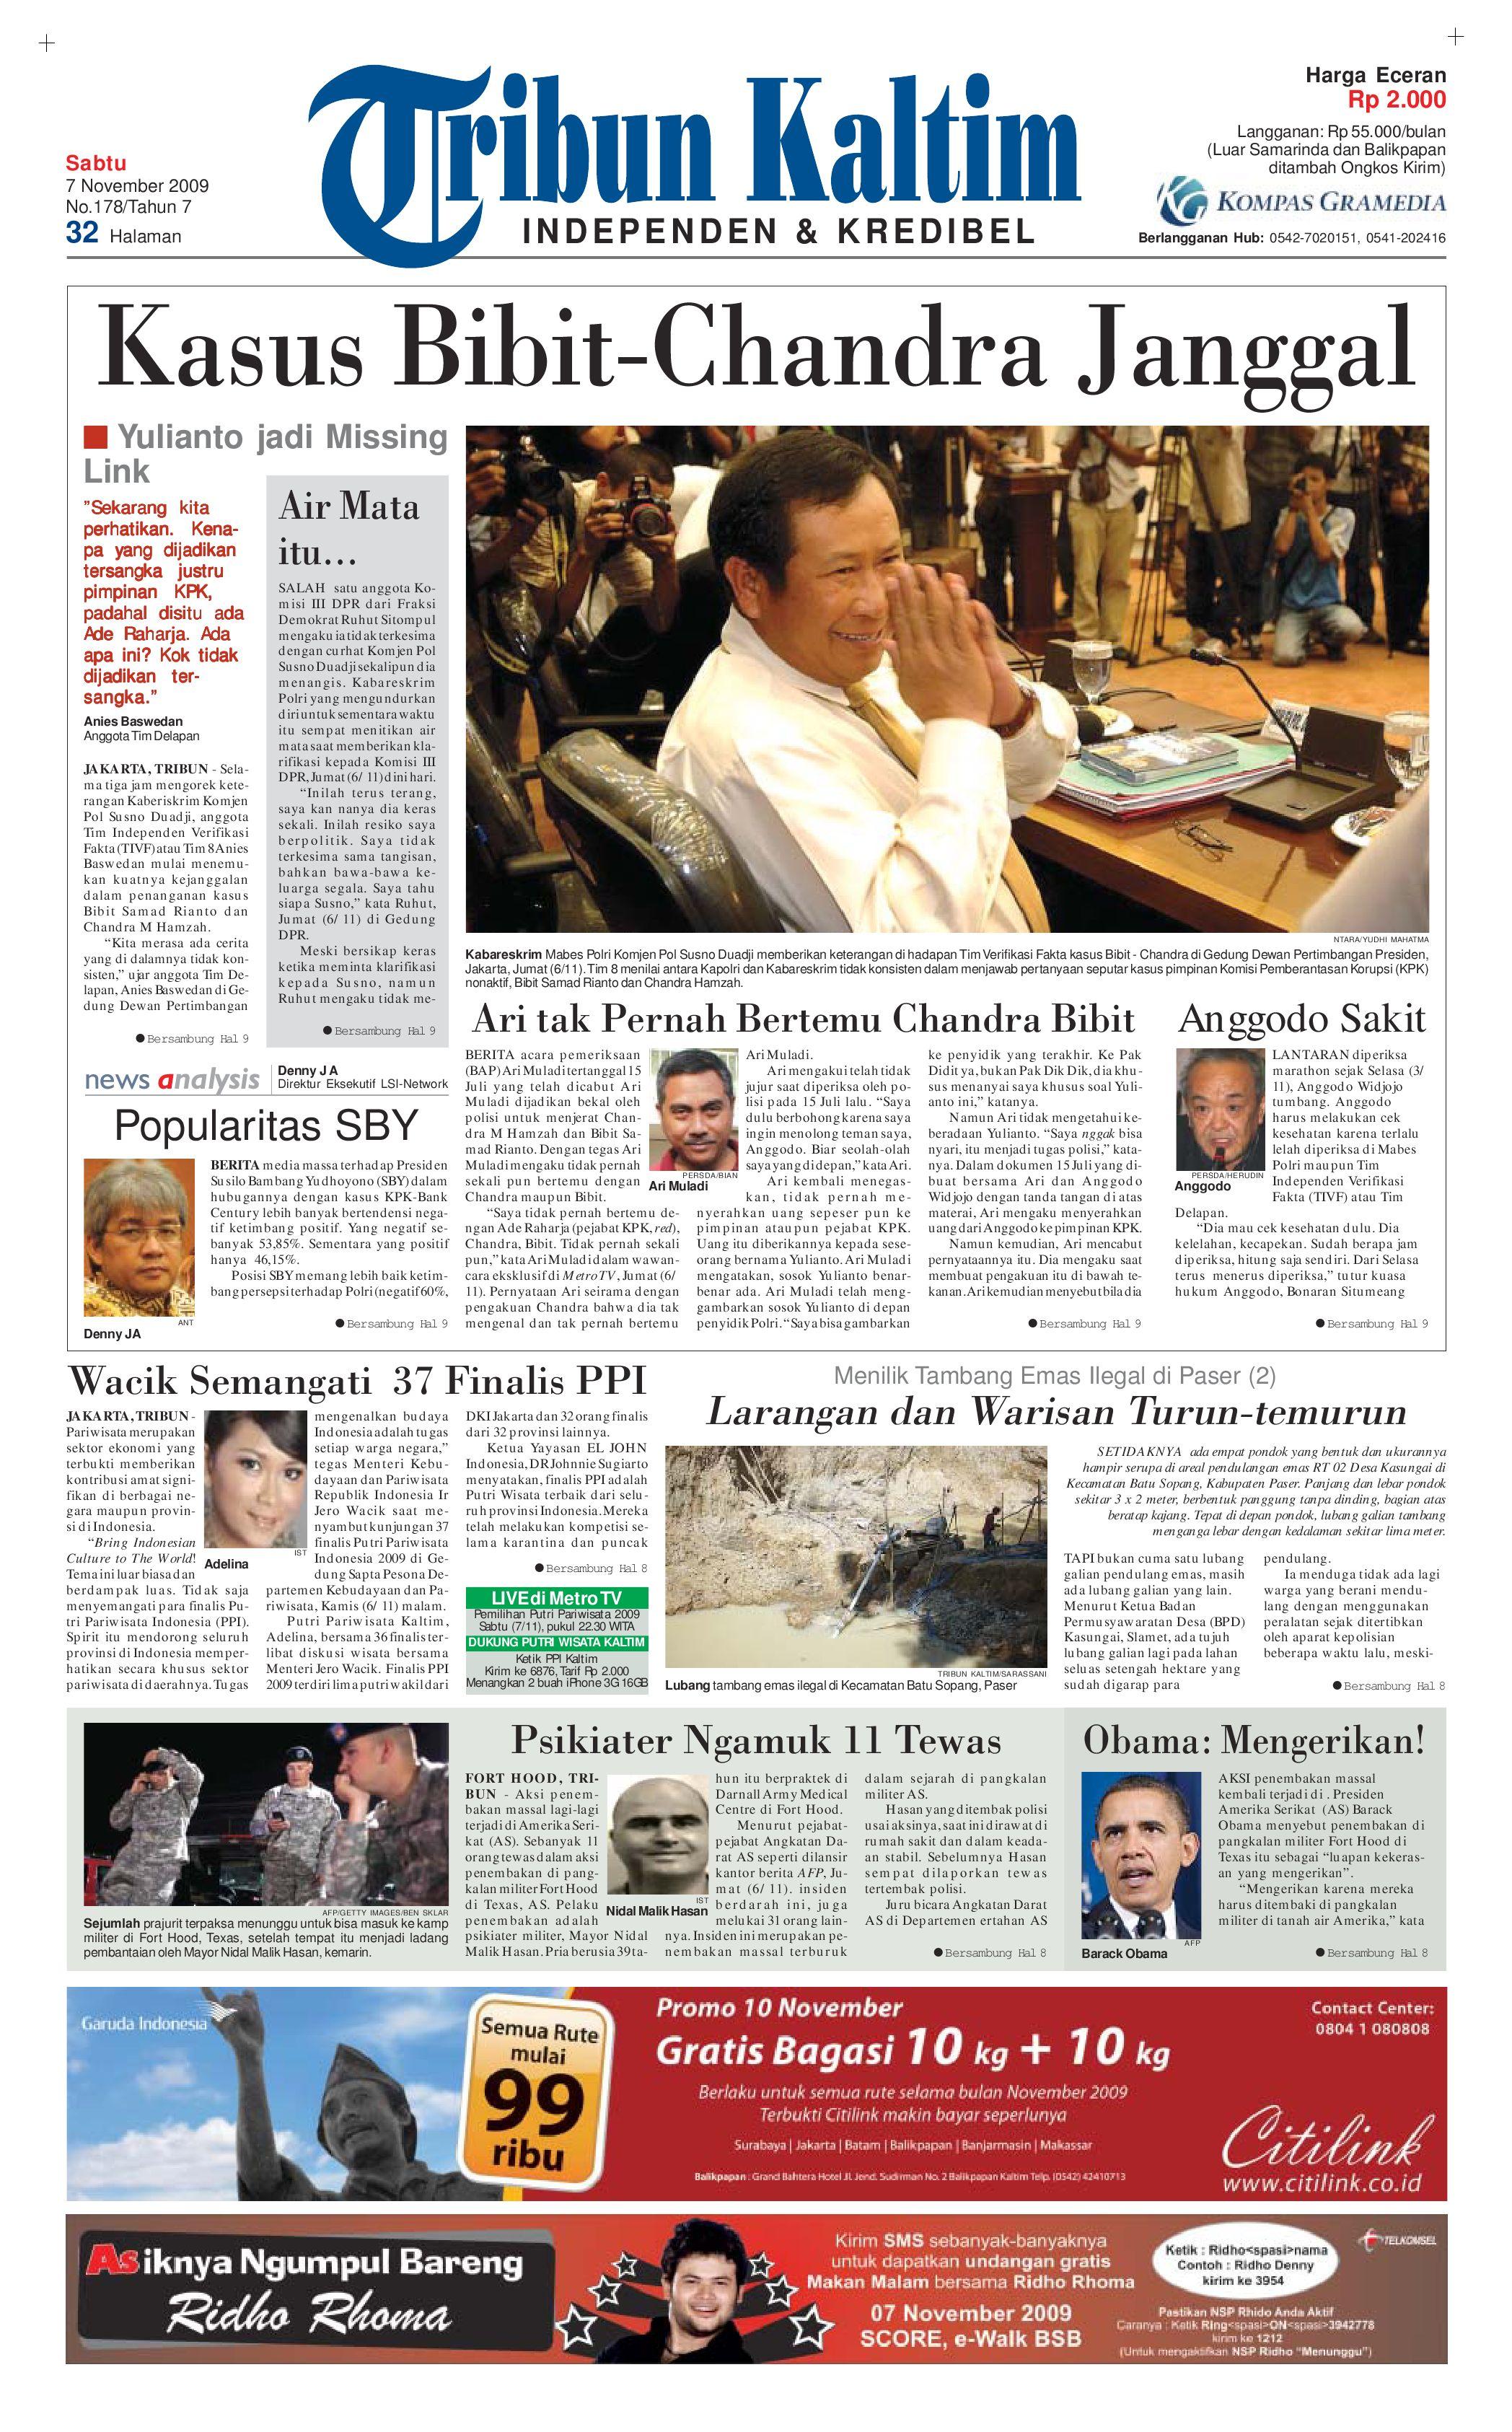 TRIBUNKALTIM - 07 NOVEMBER 2009 by tohir tribun - issuu a581b5c1ea862